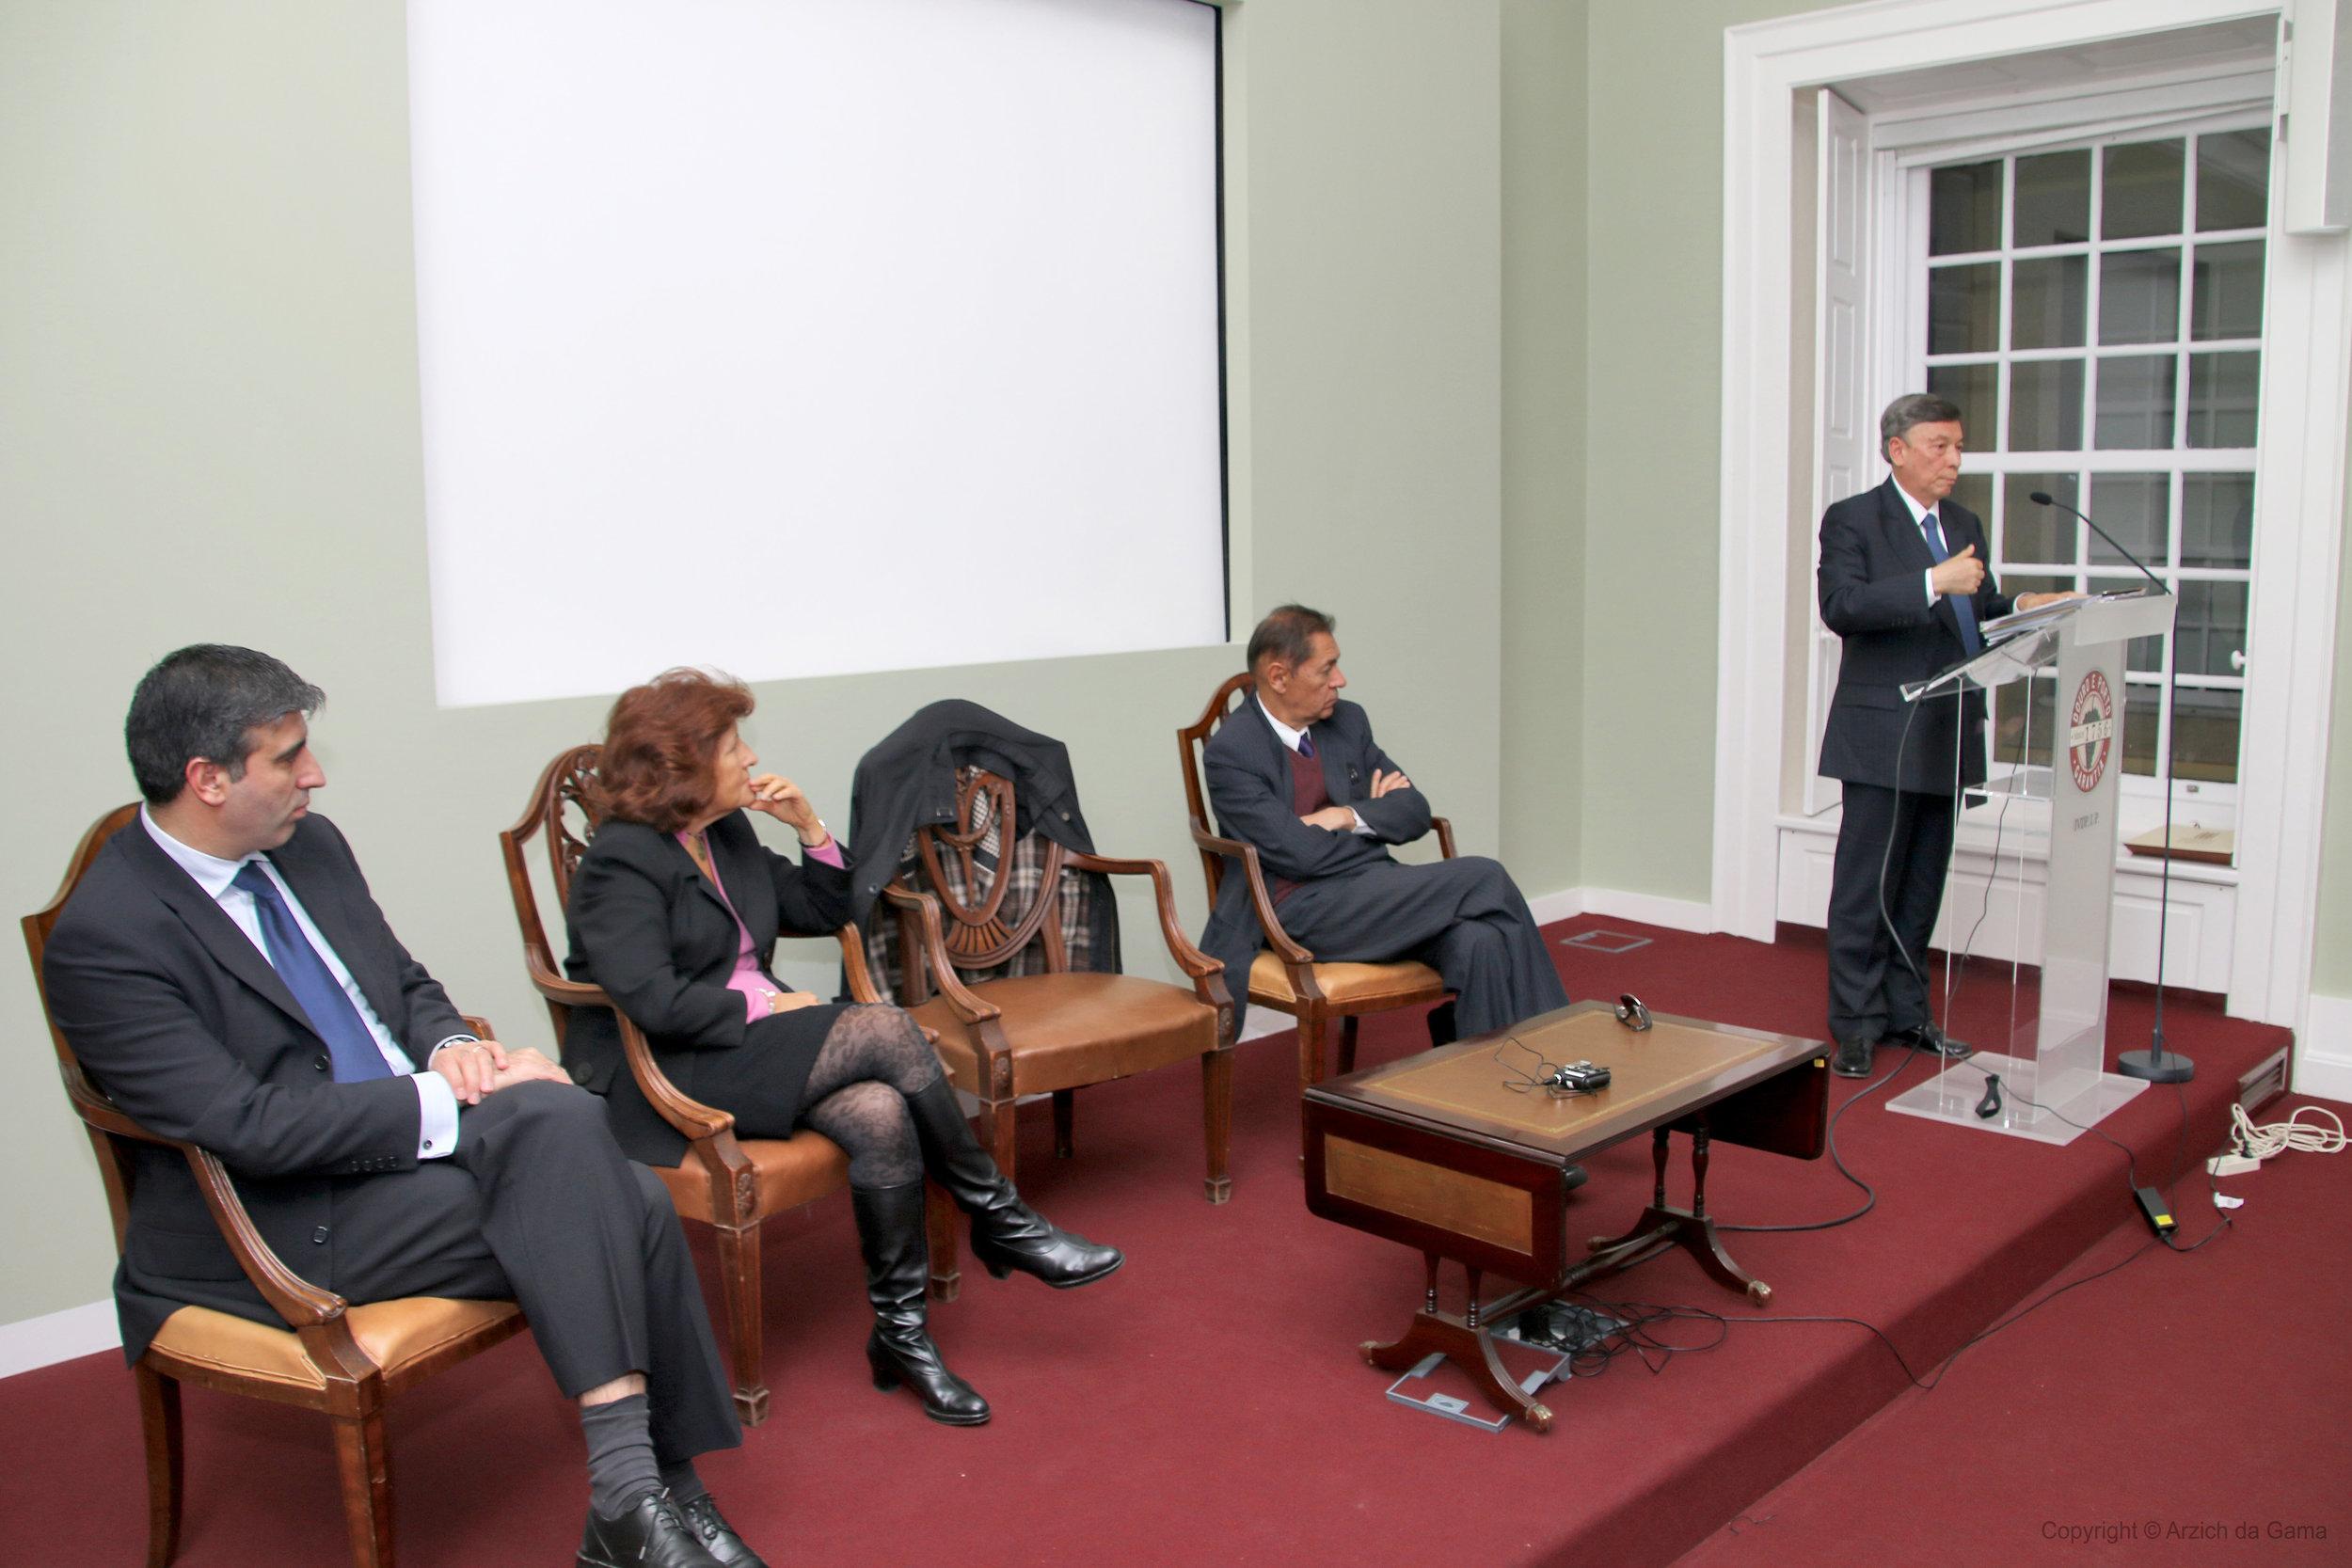 Copy of Copy of ArzichdaGama_Corporate Event Instituto Int. Macau